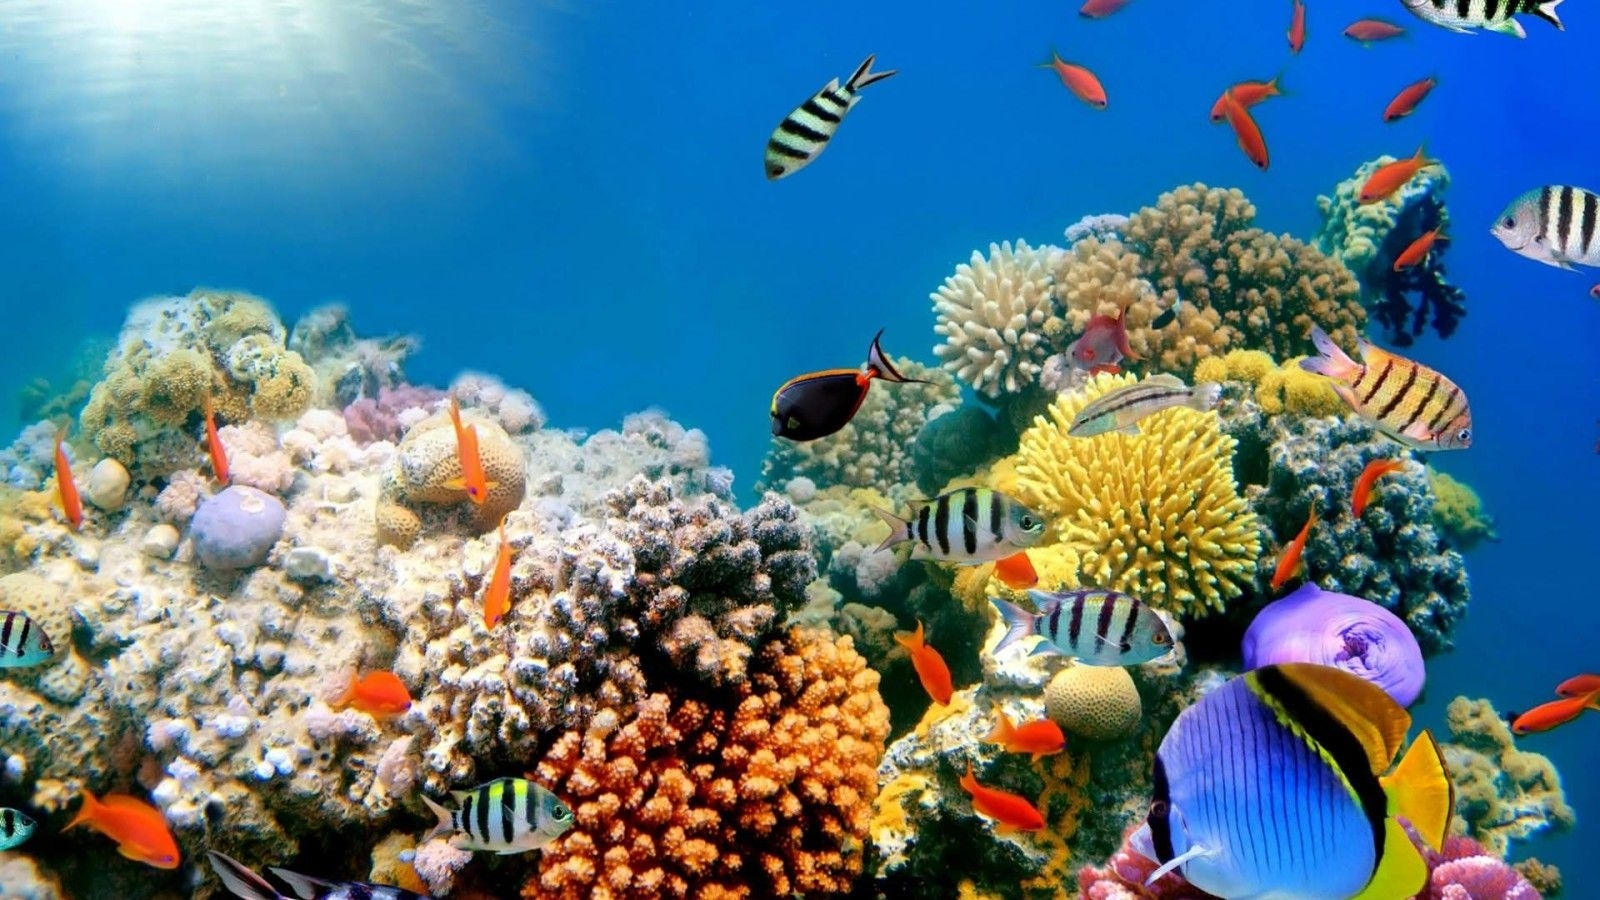 coral reefs wallpapers hd widescreen desktop backgrounds | hd